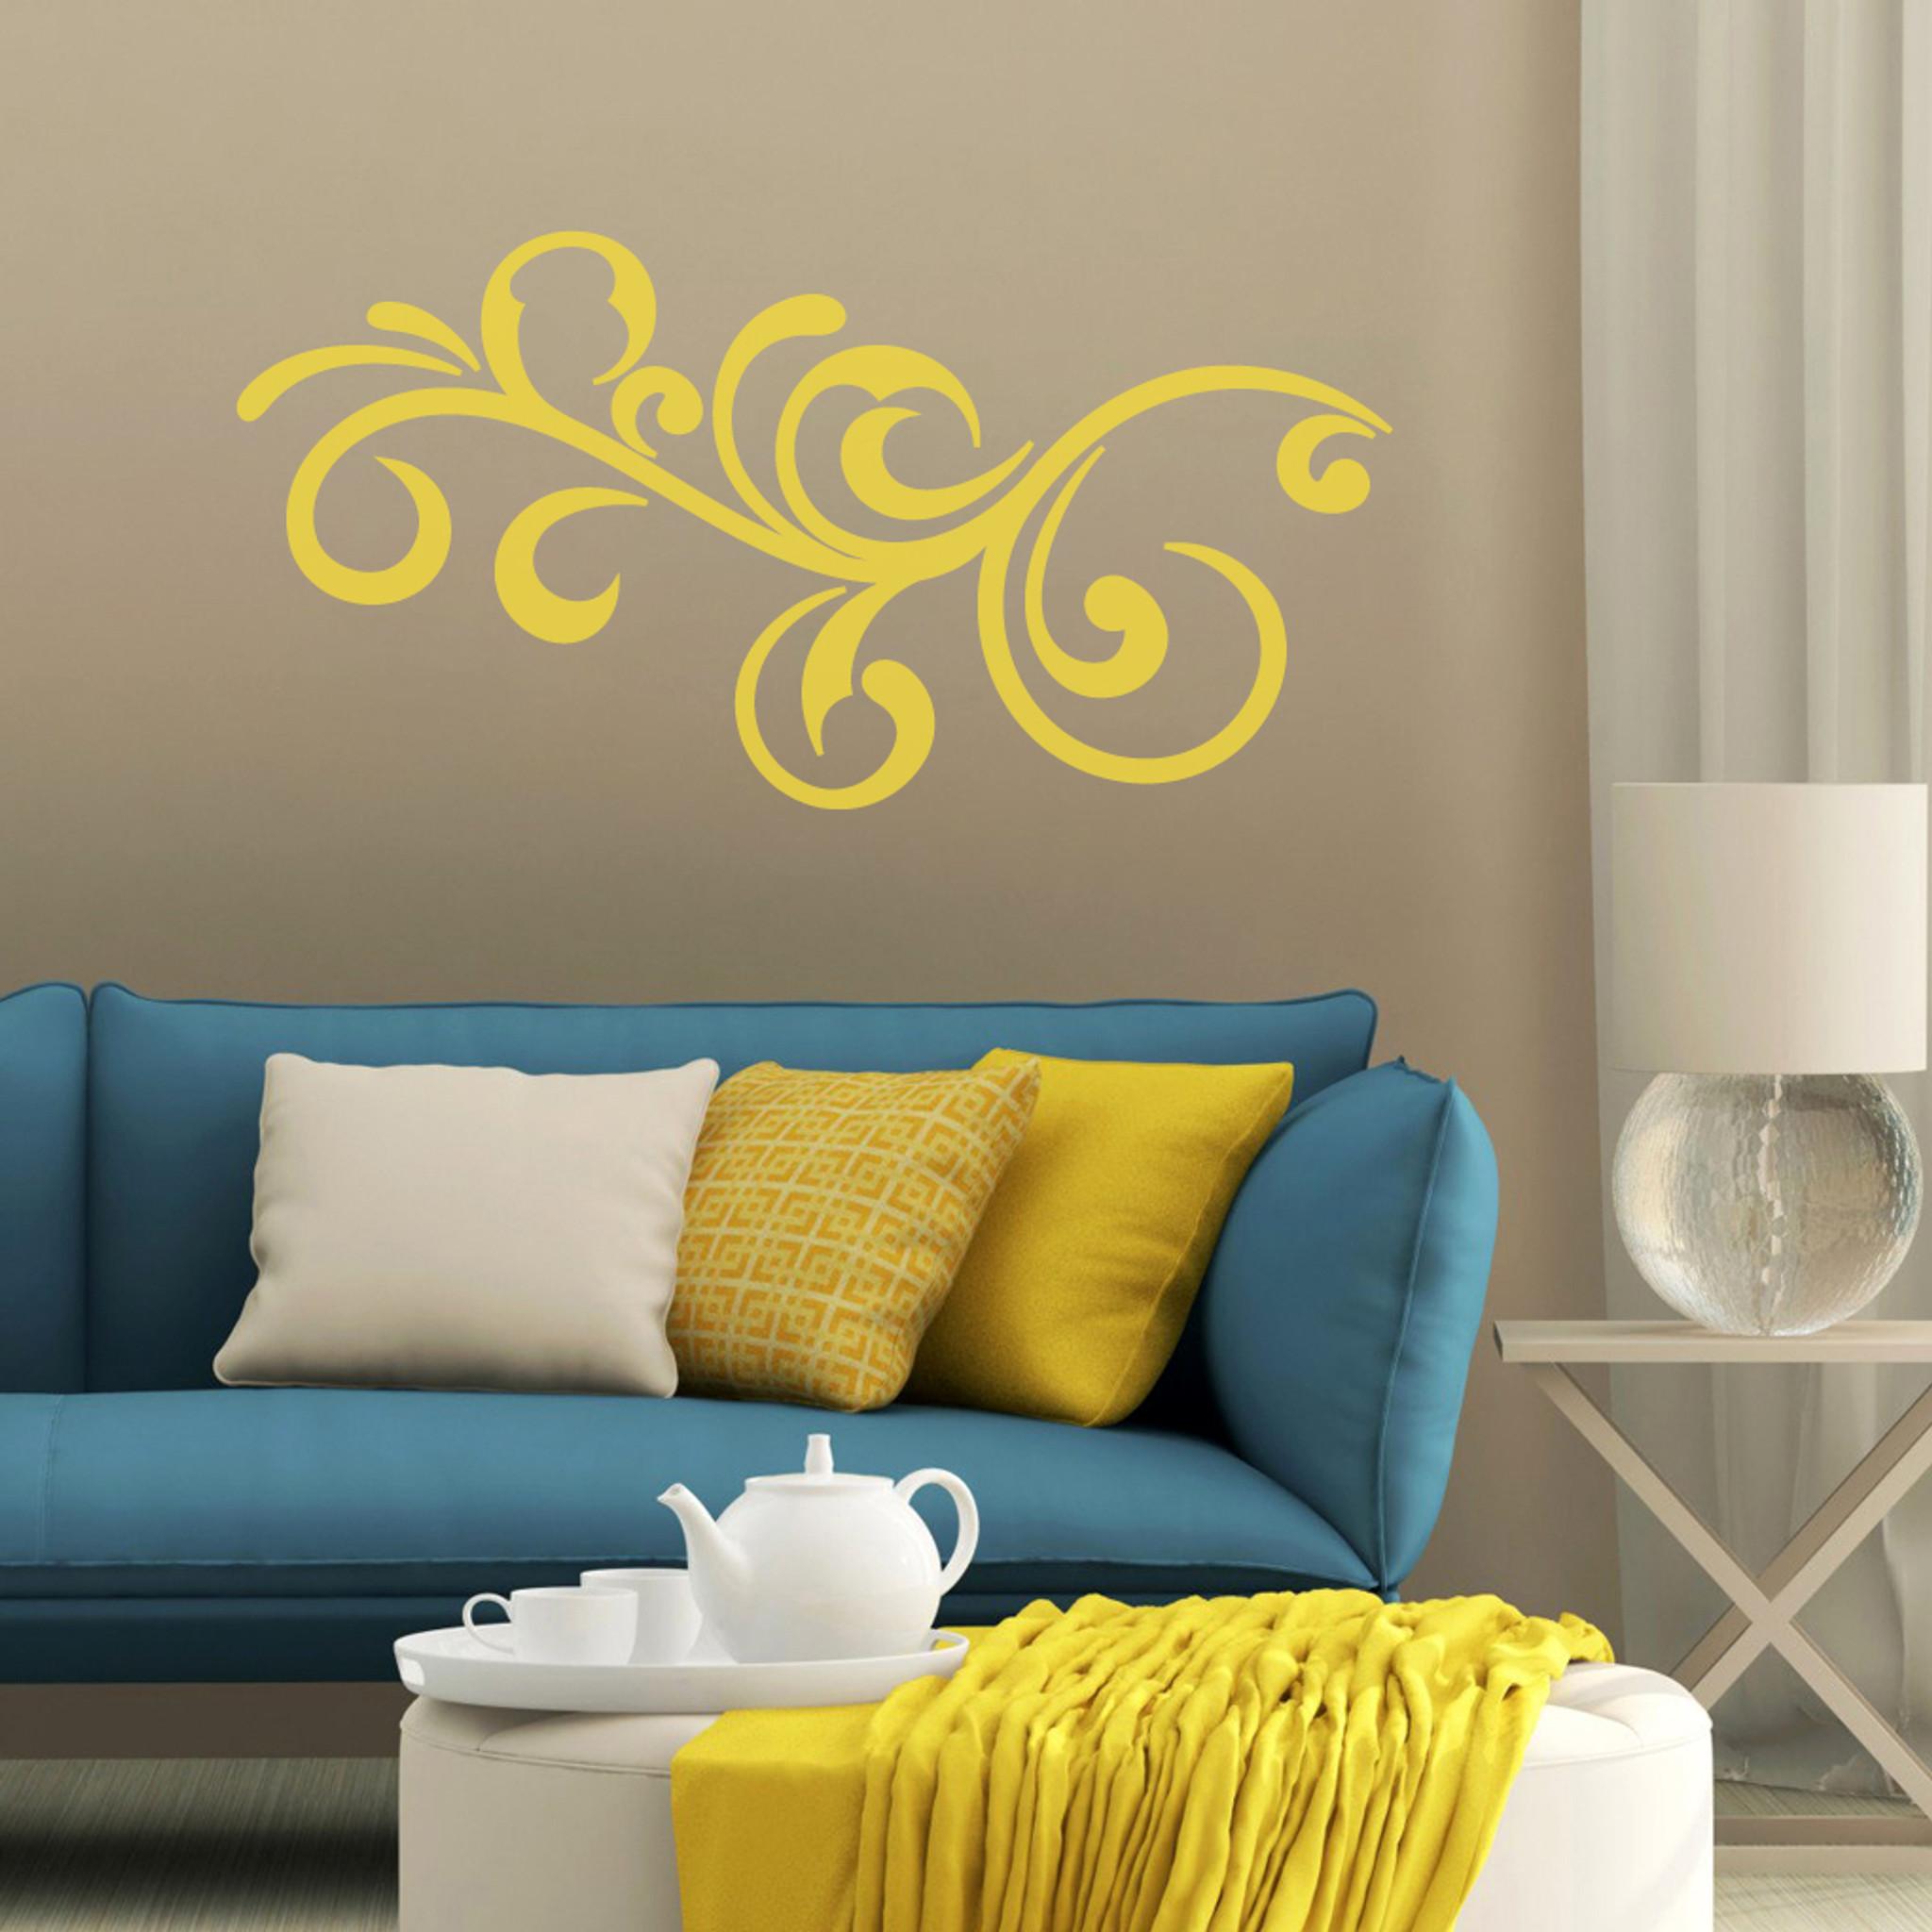 Decorative Scroll Flourish Wall Decals Wall Decor Stickers